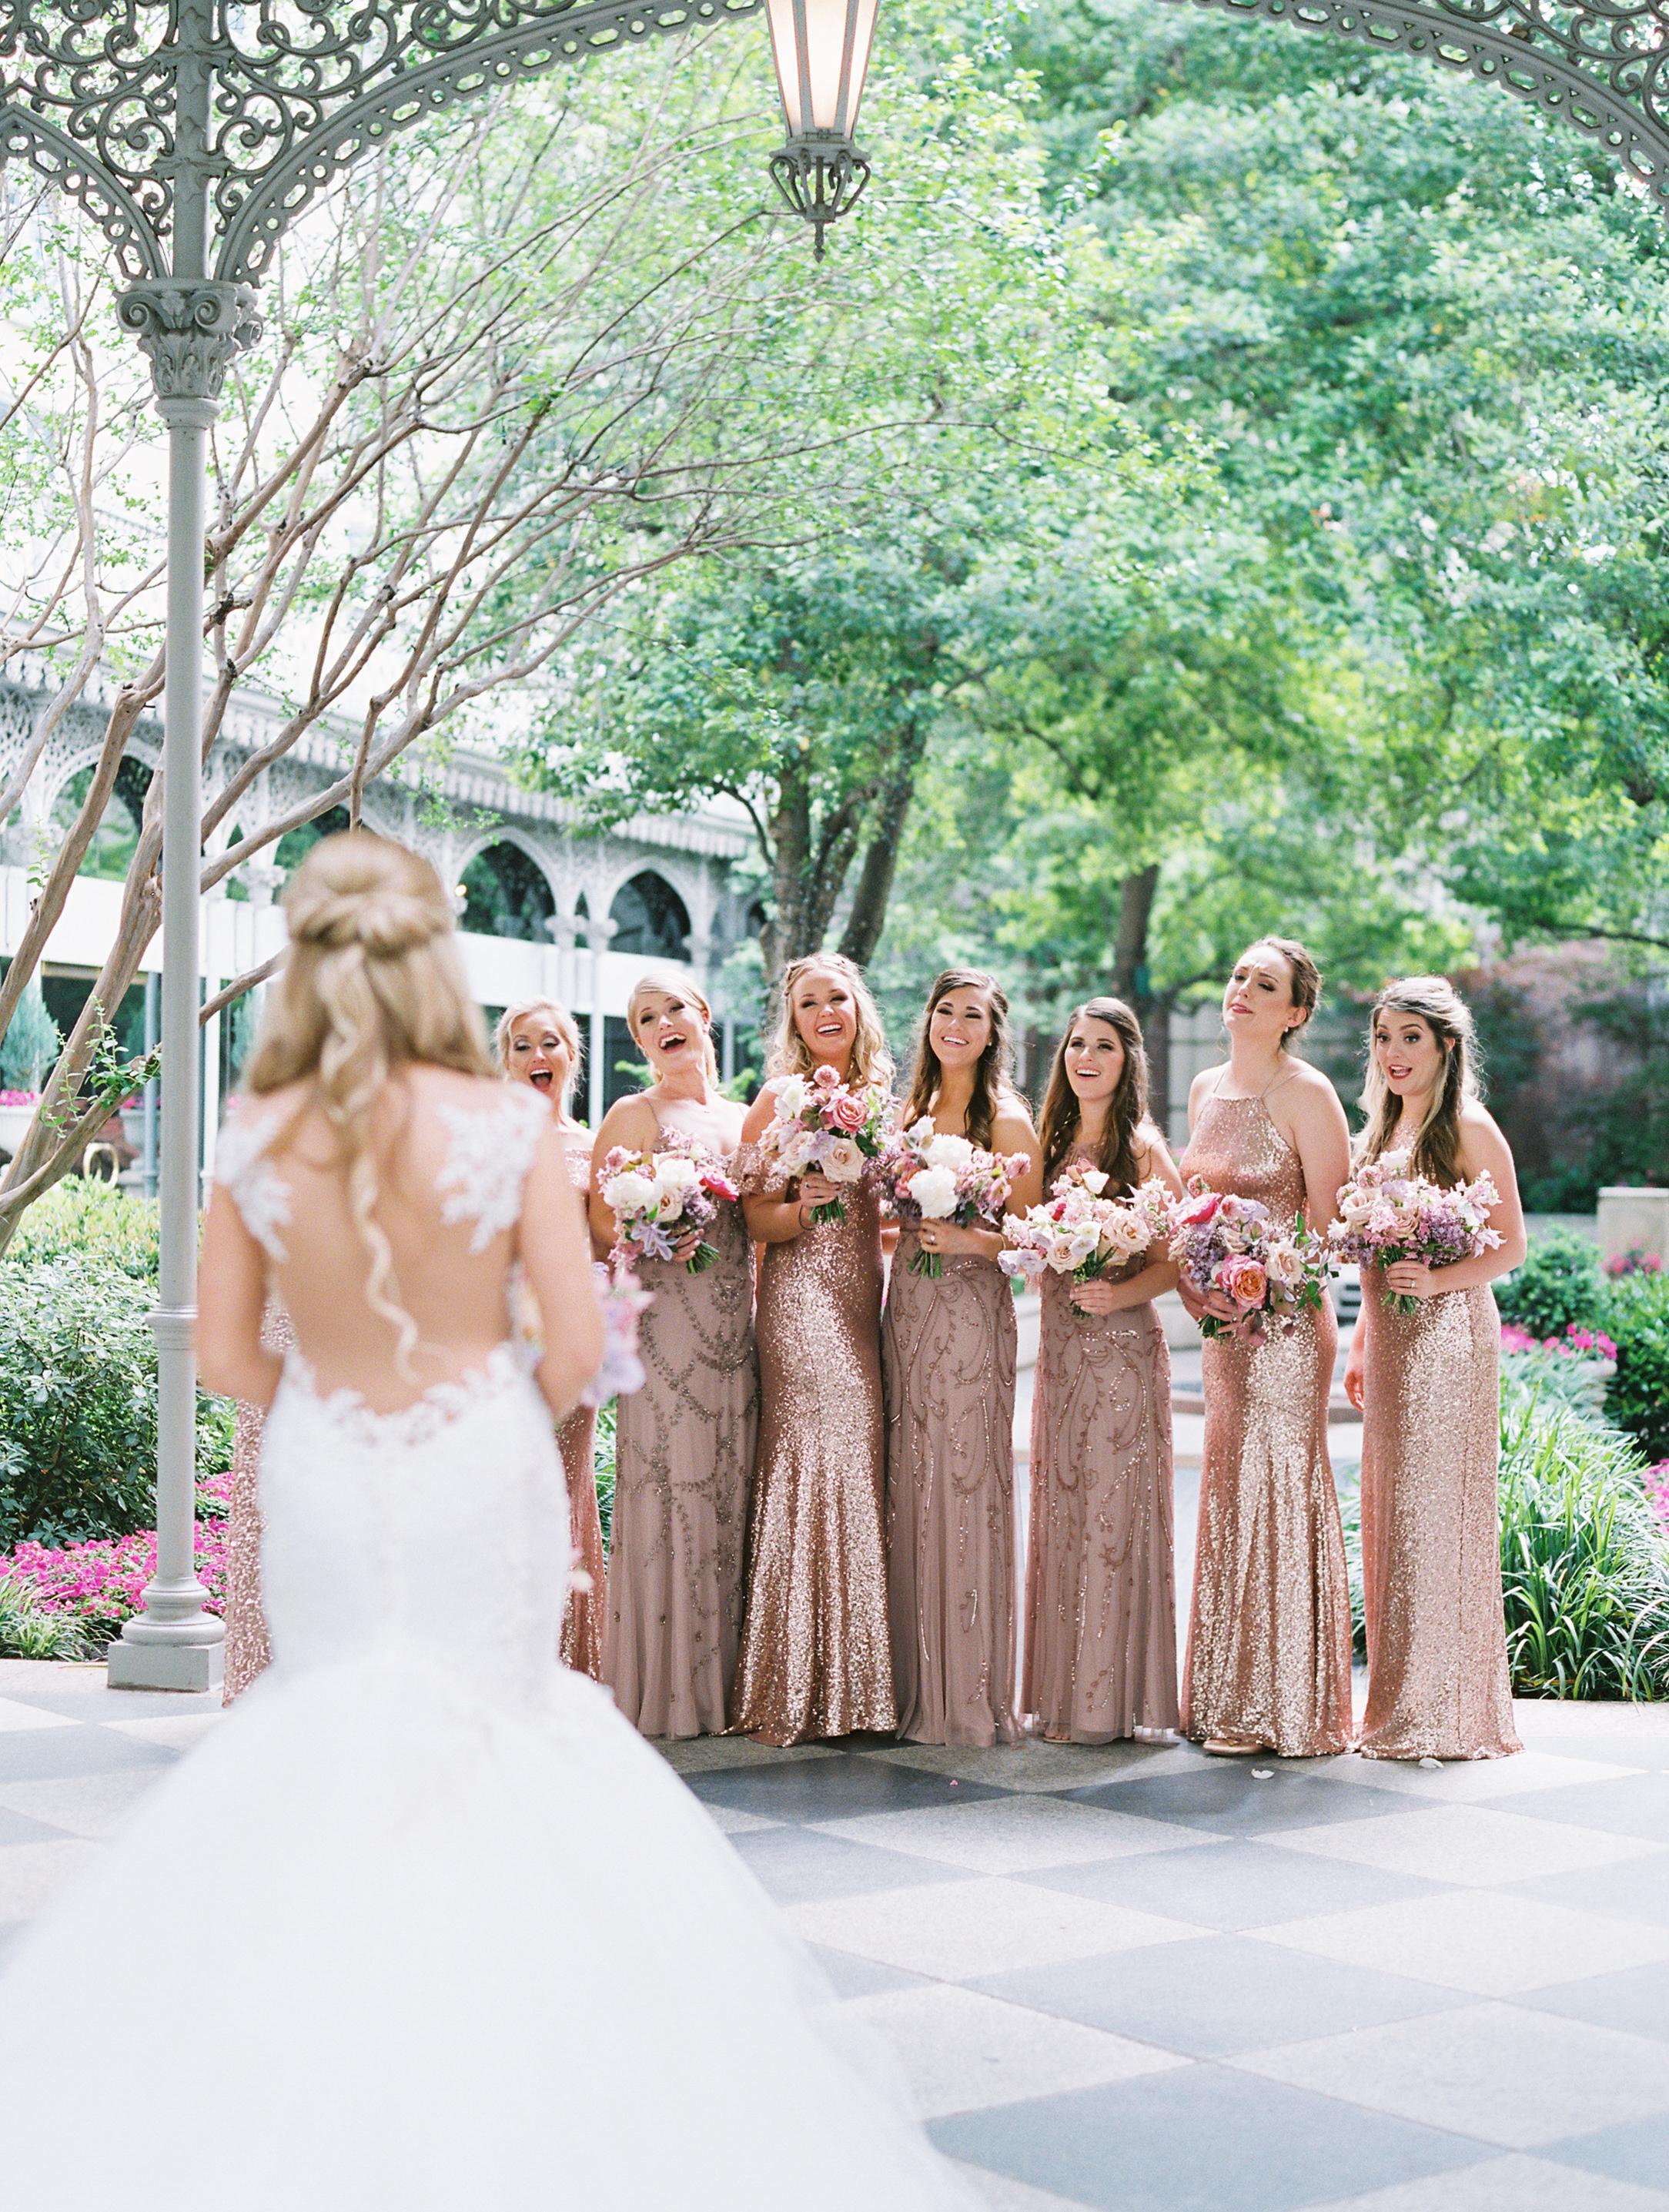 Blakeley-bridesmaids-reveal-Ivory-and-Vine.JPG